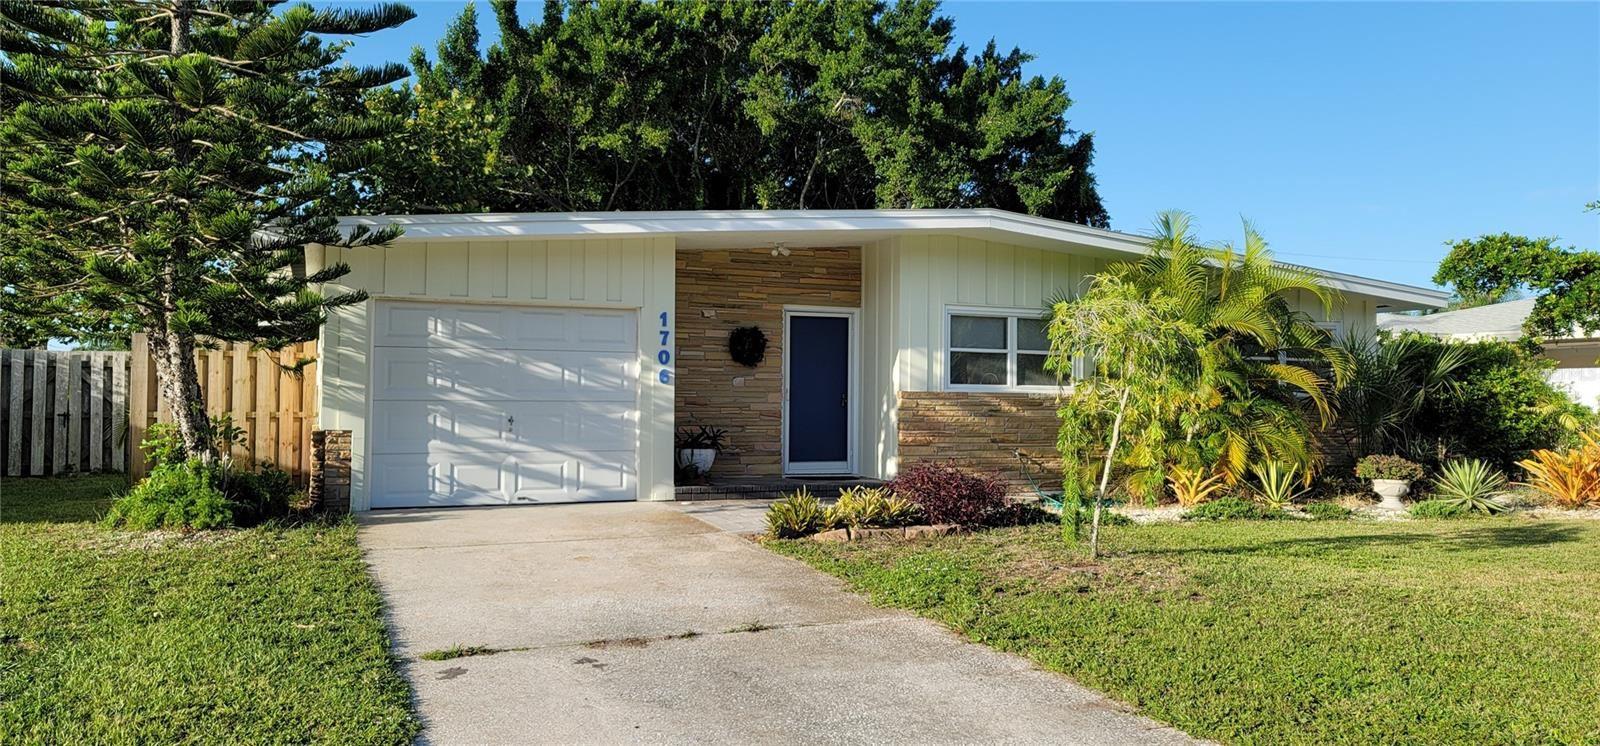 1706 LIVINGSTONE STREET, Sarasota, FL 34231 - #: A4508277